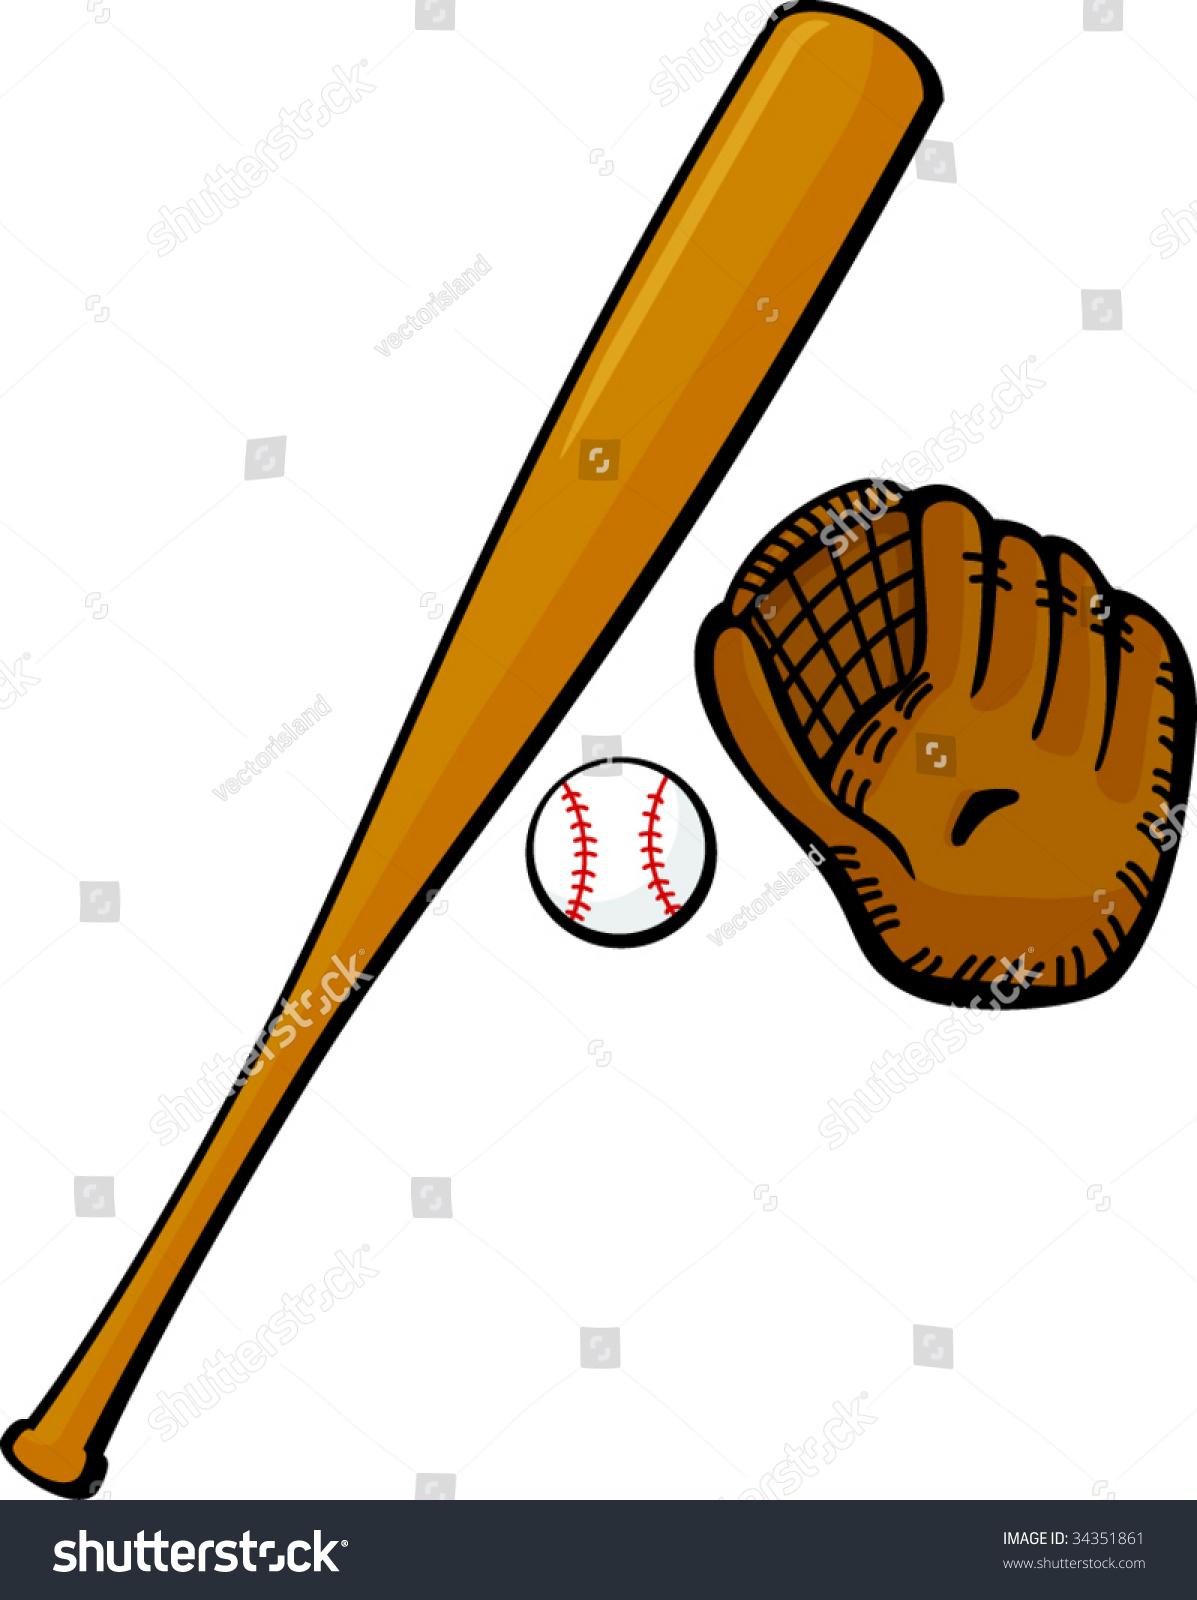 Descriptive essay on a baseball bat